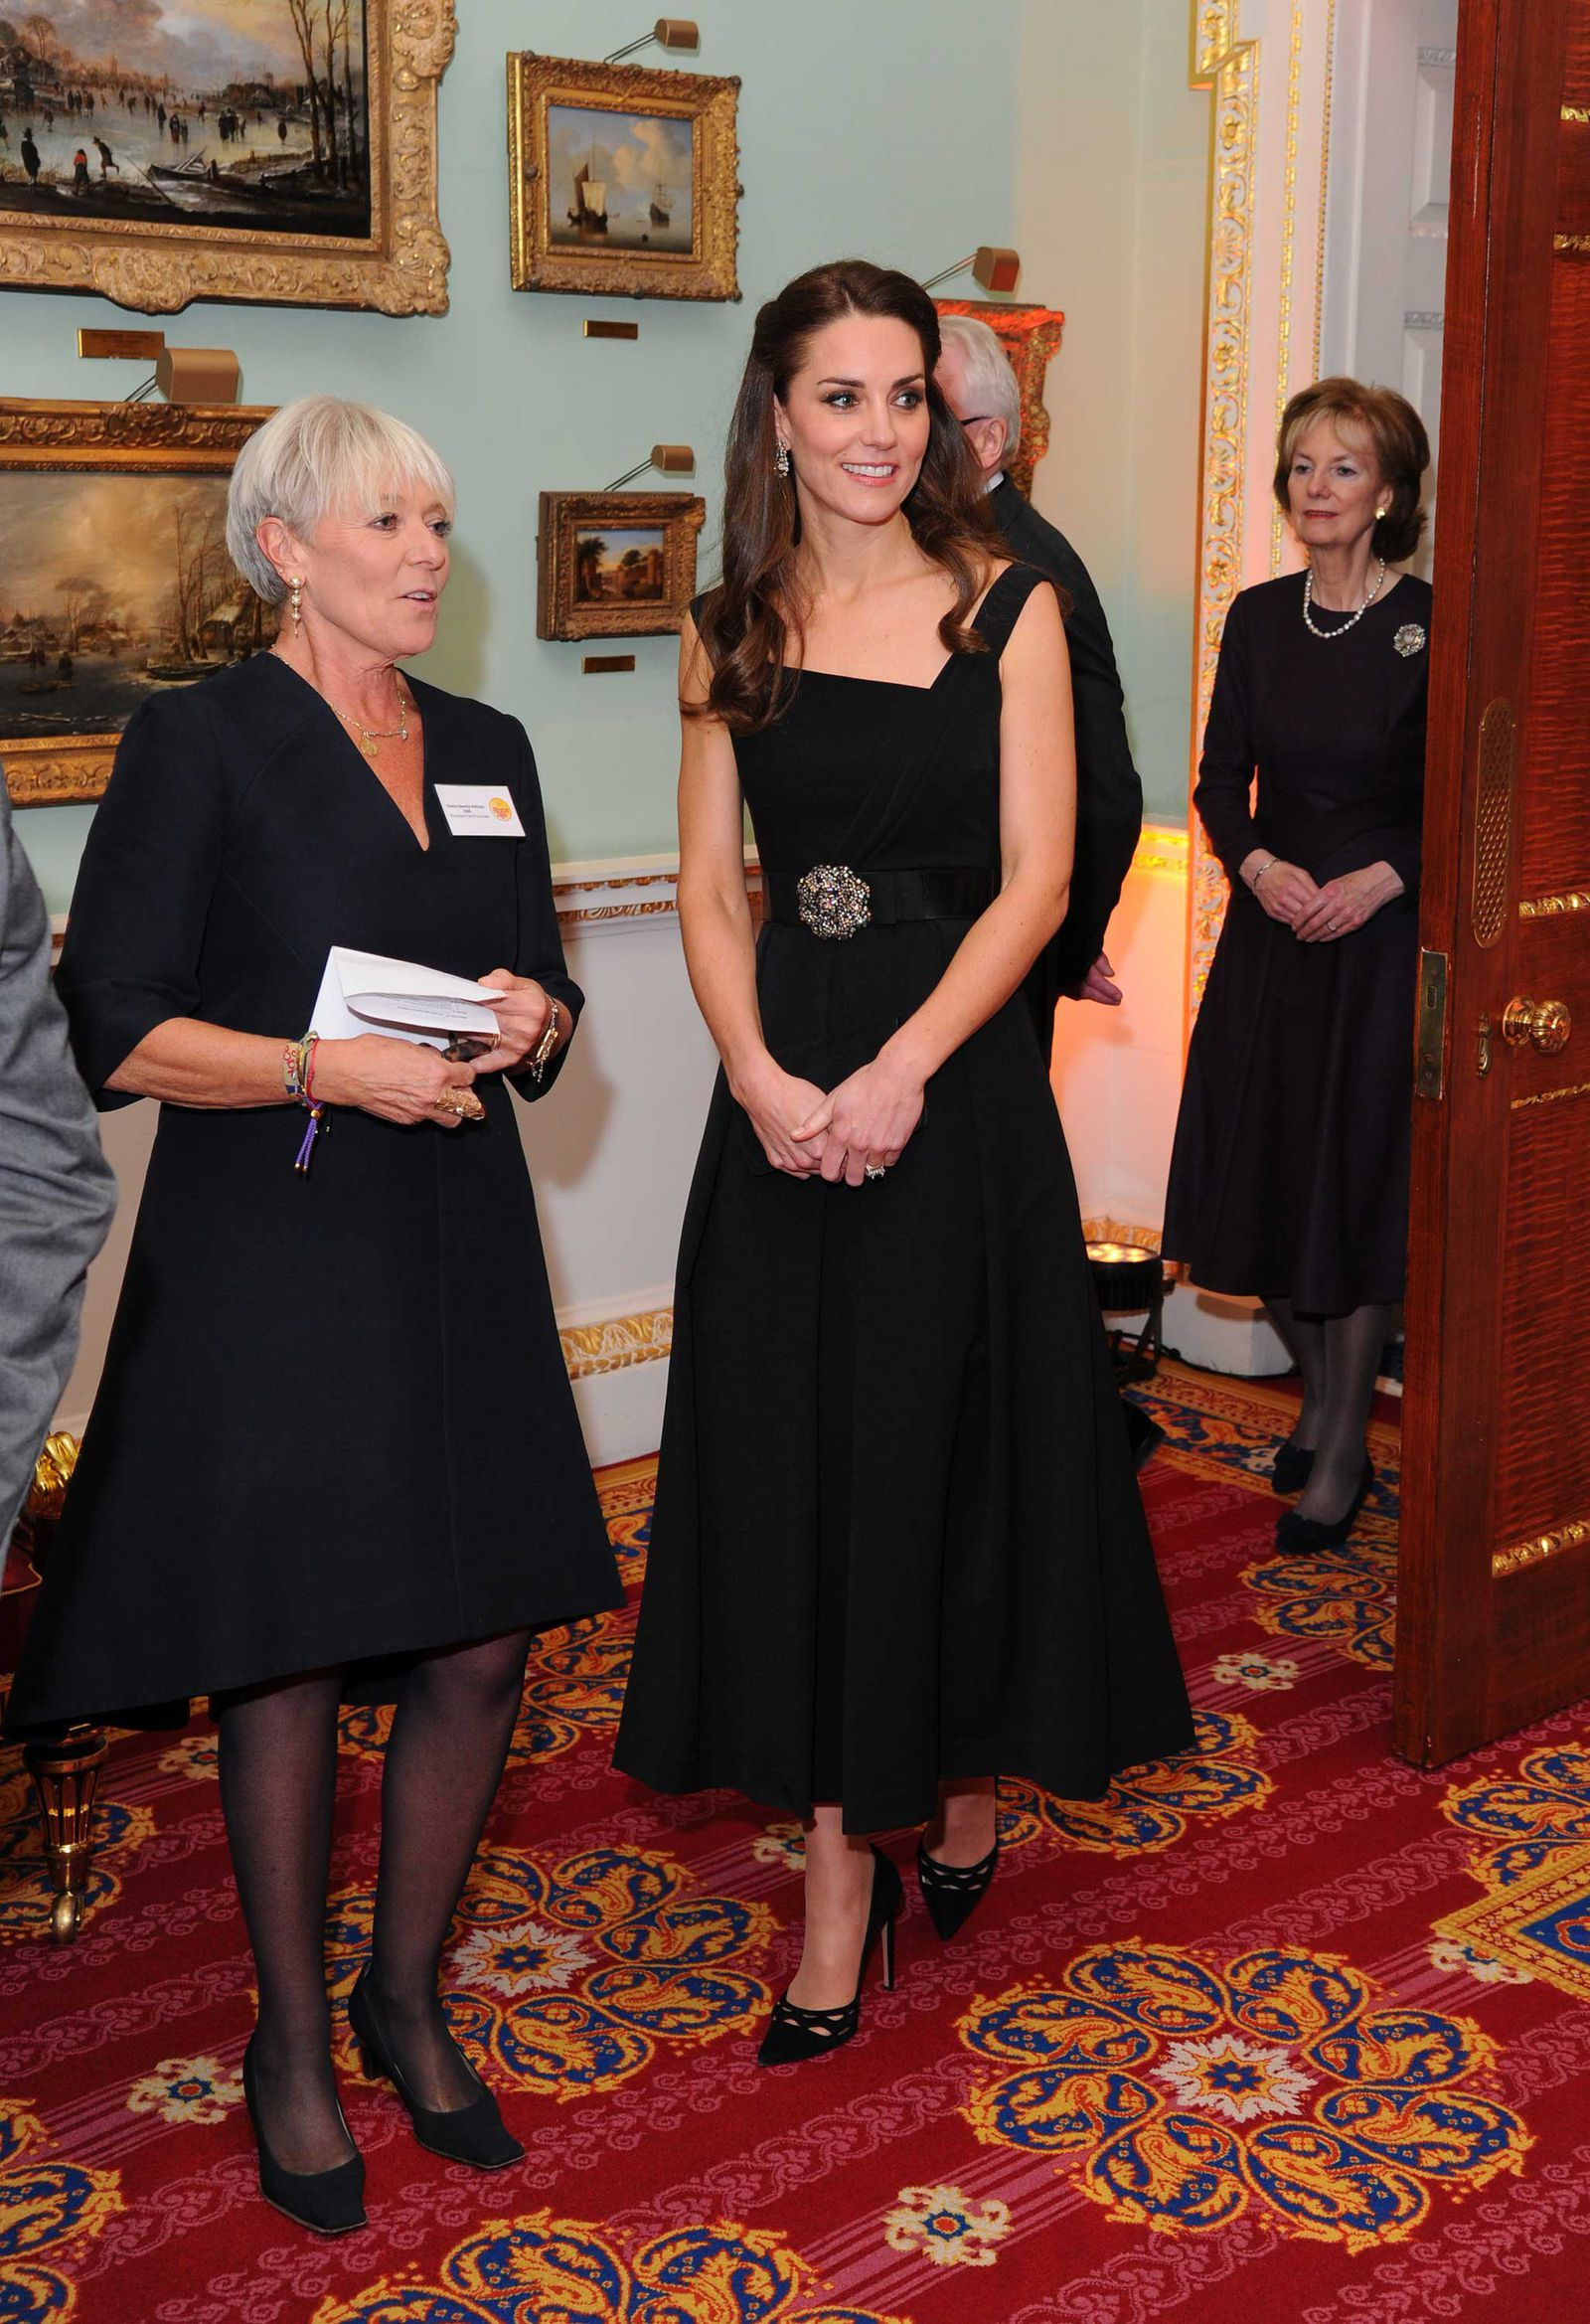 Photos Of Kate Middleton S Amazing Style Moments Through The Years Kate Middleton Style Duchess Kate Kate Middleton Outfits